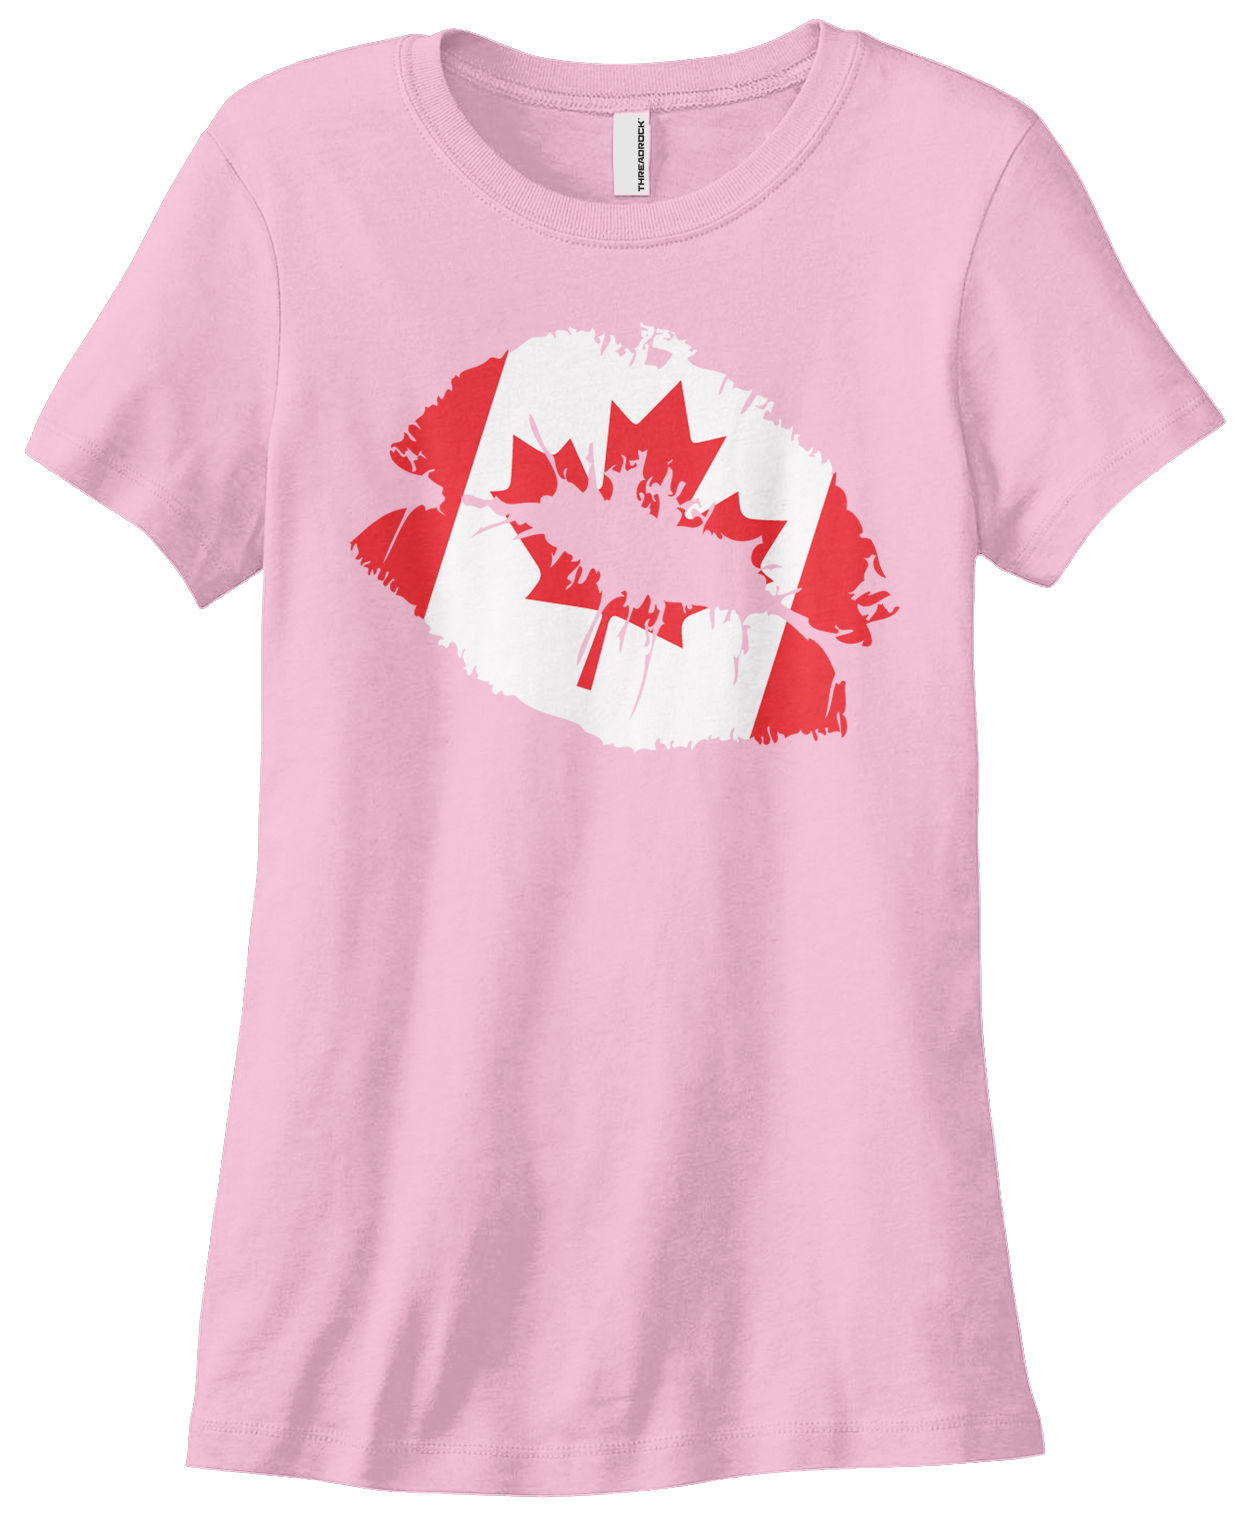 Image result for canada flag shirt